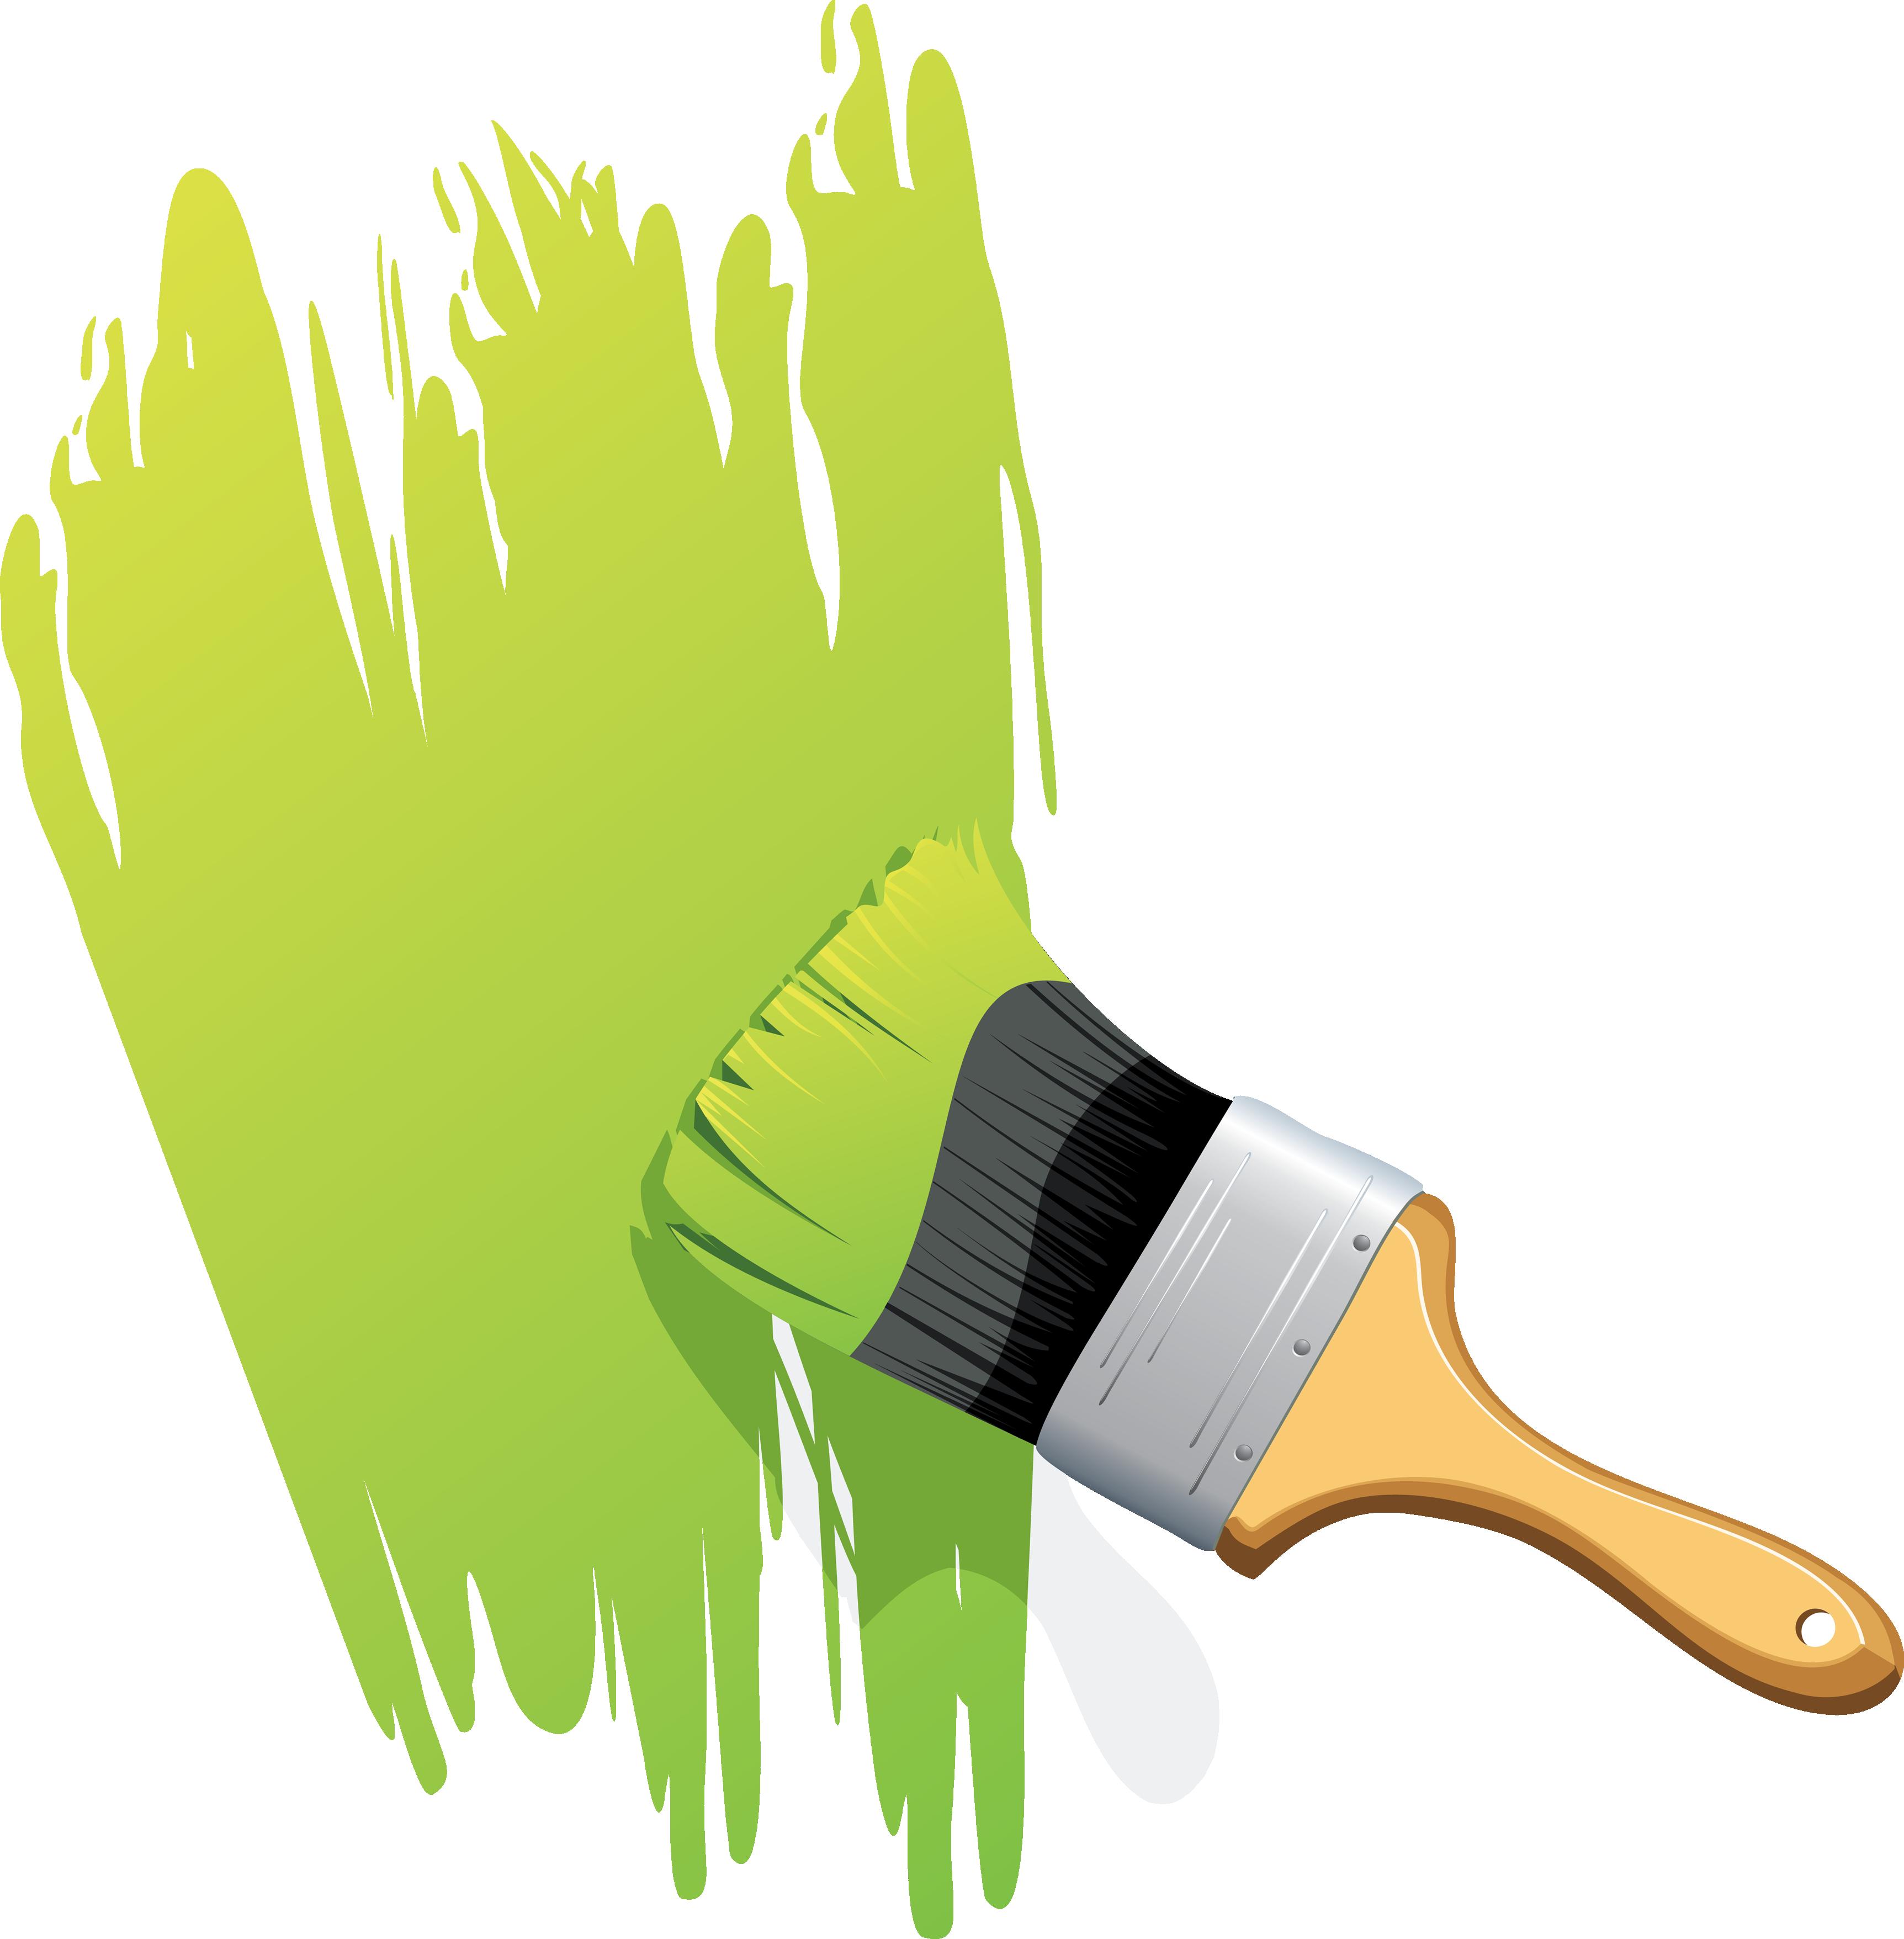 Brushes pinterest. Gloves clipart construction